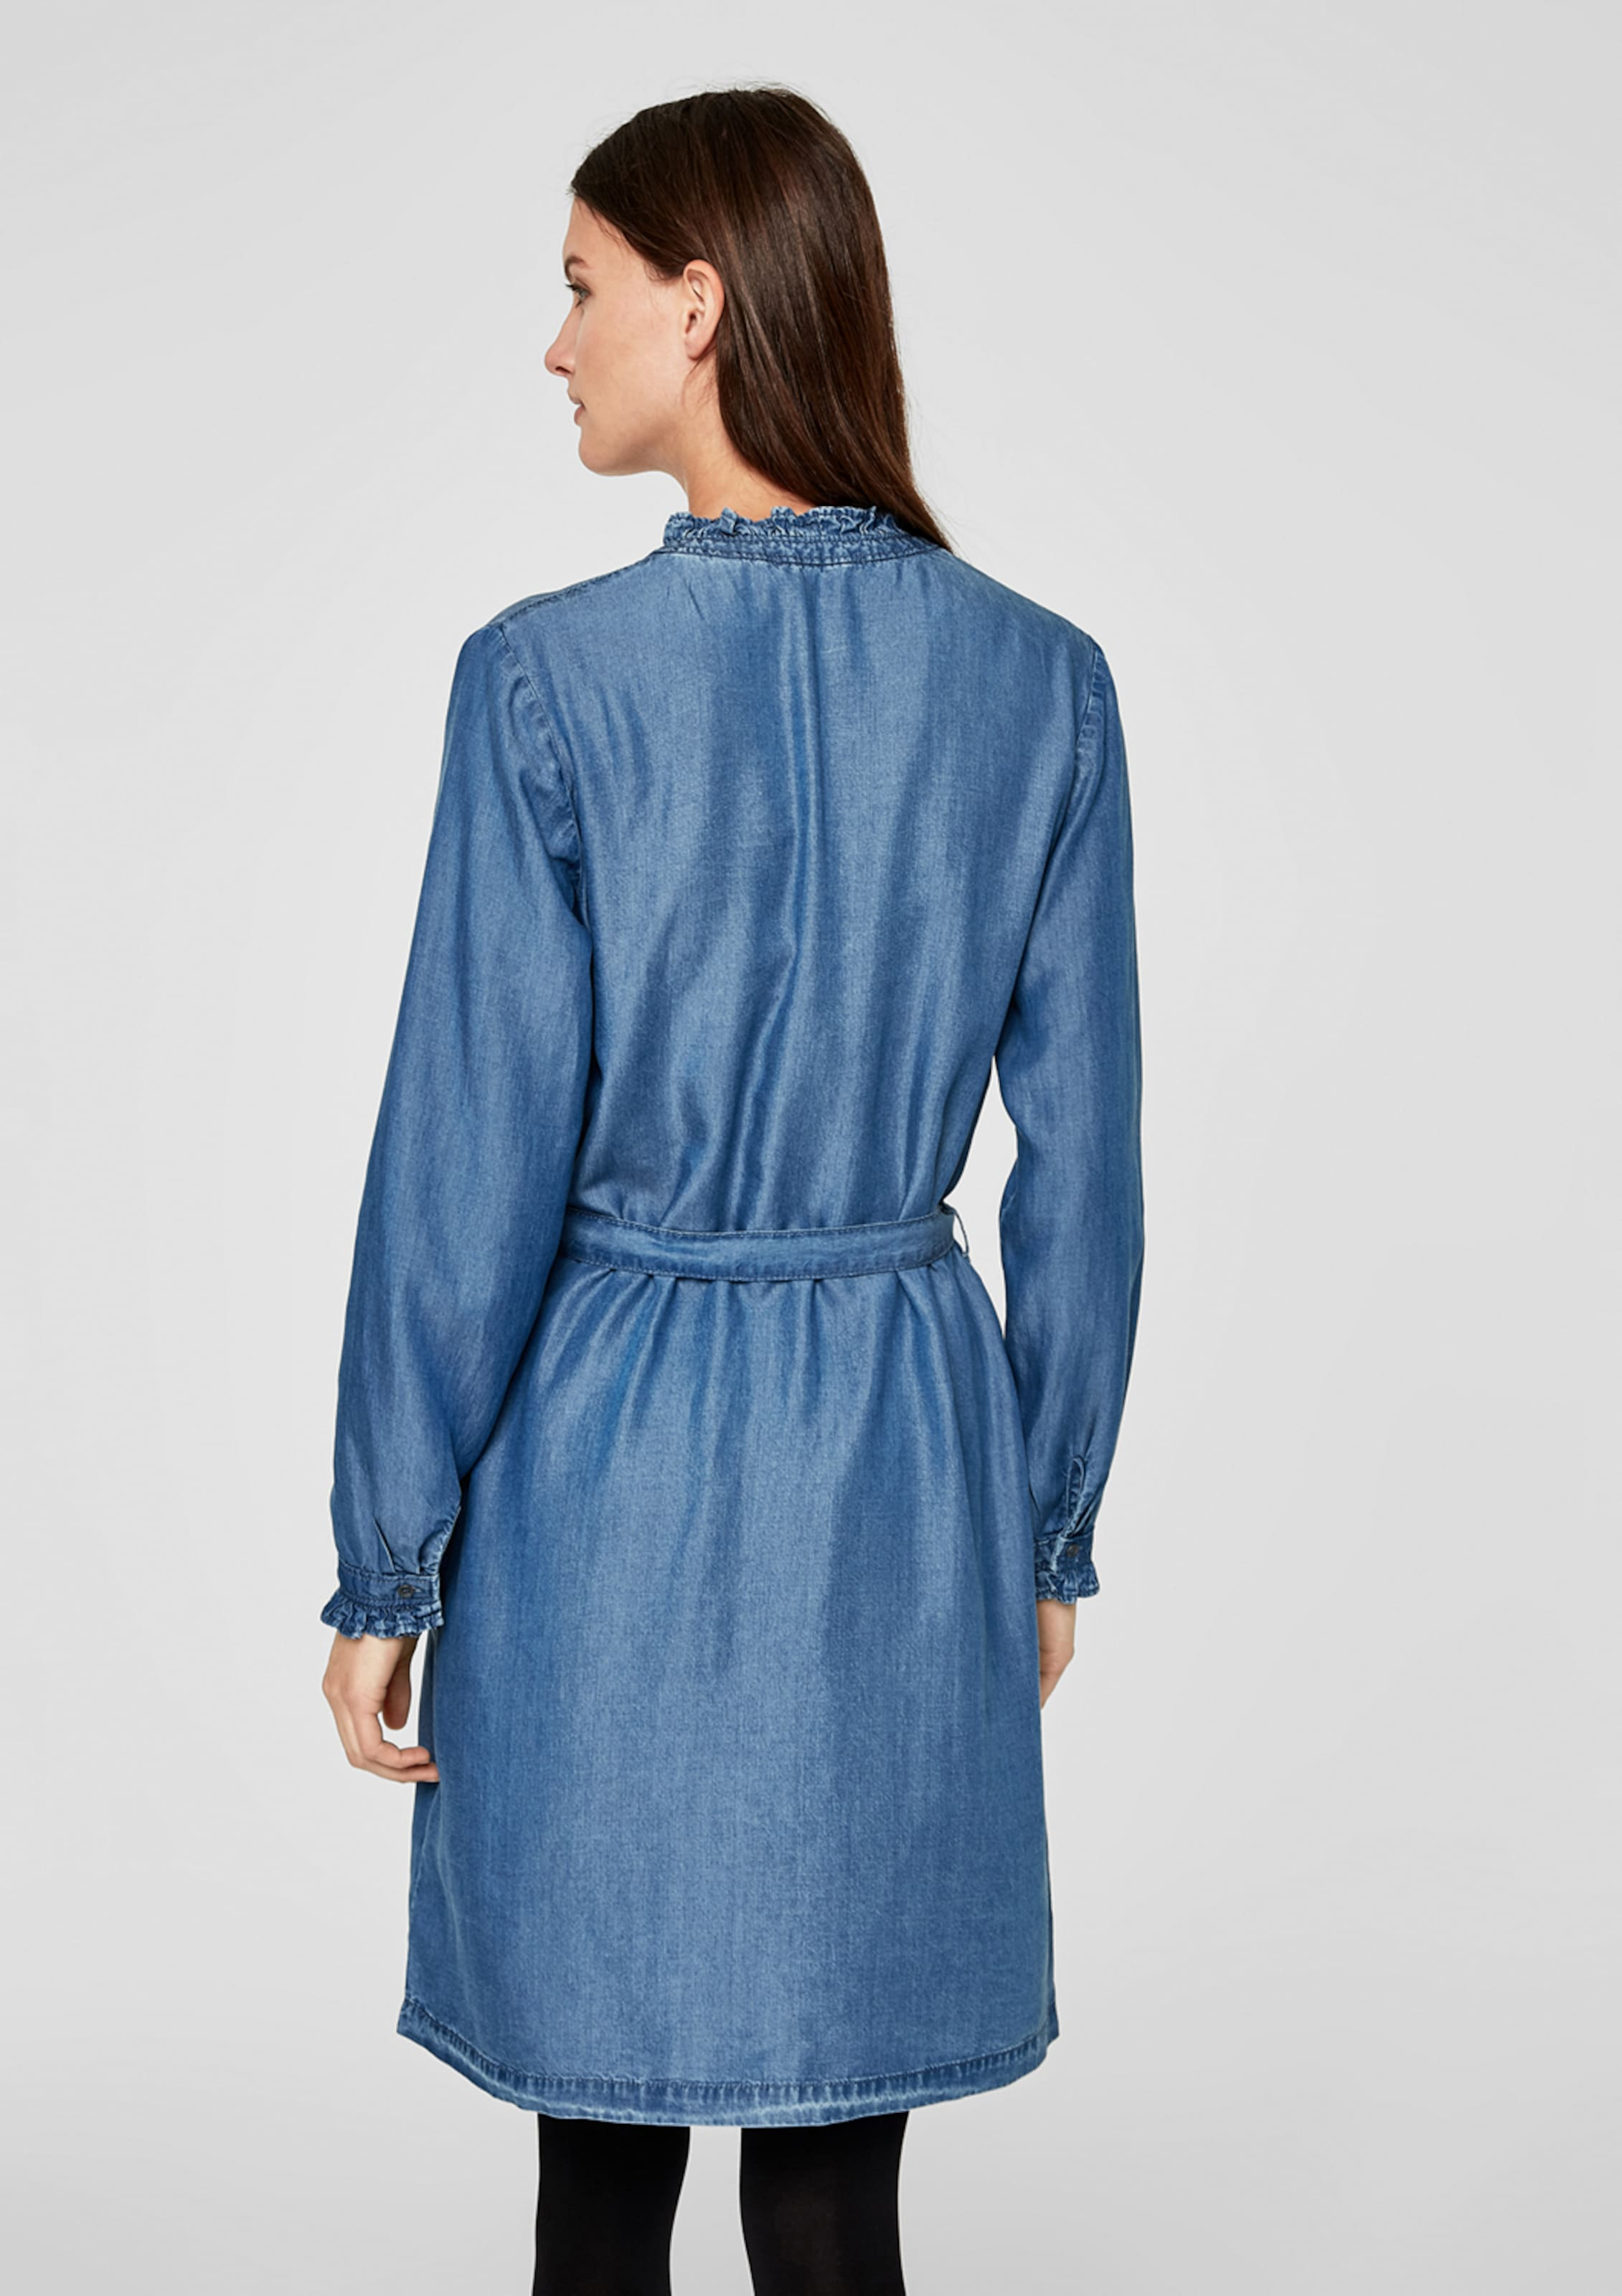 oliver Blue Red Denim Kleid In S Label rdCxoeBQWE